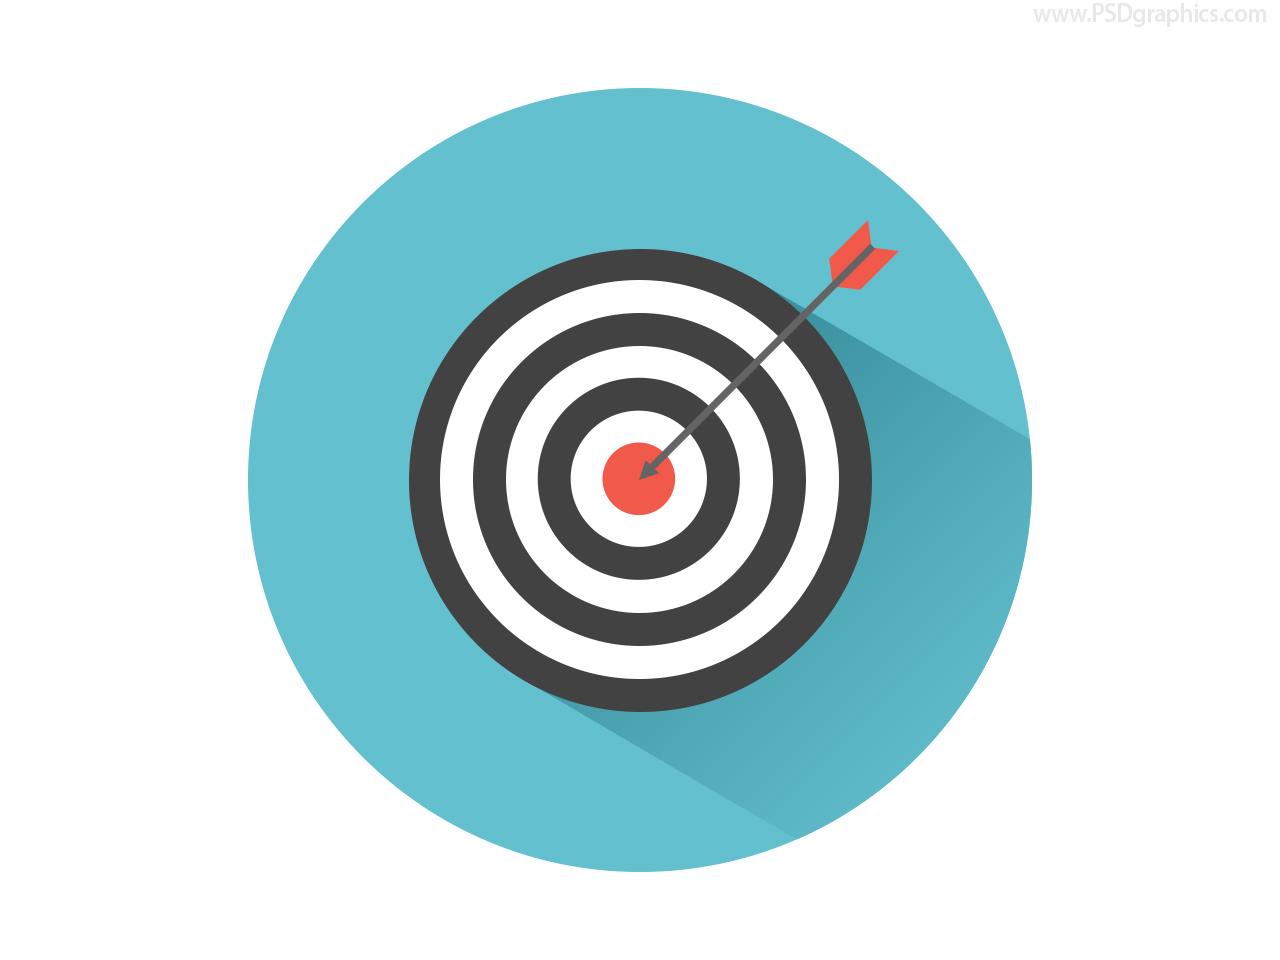 Dart On Target Icon Psd Psdgraphics